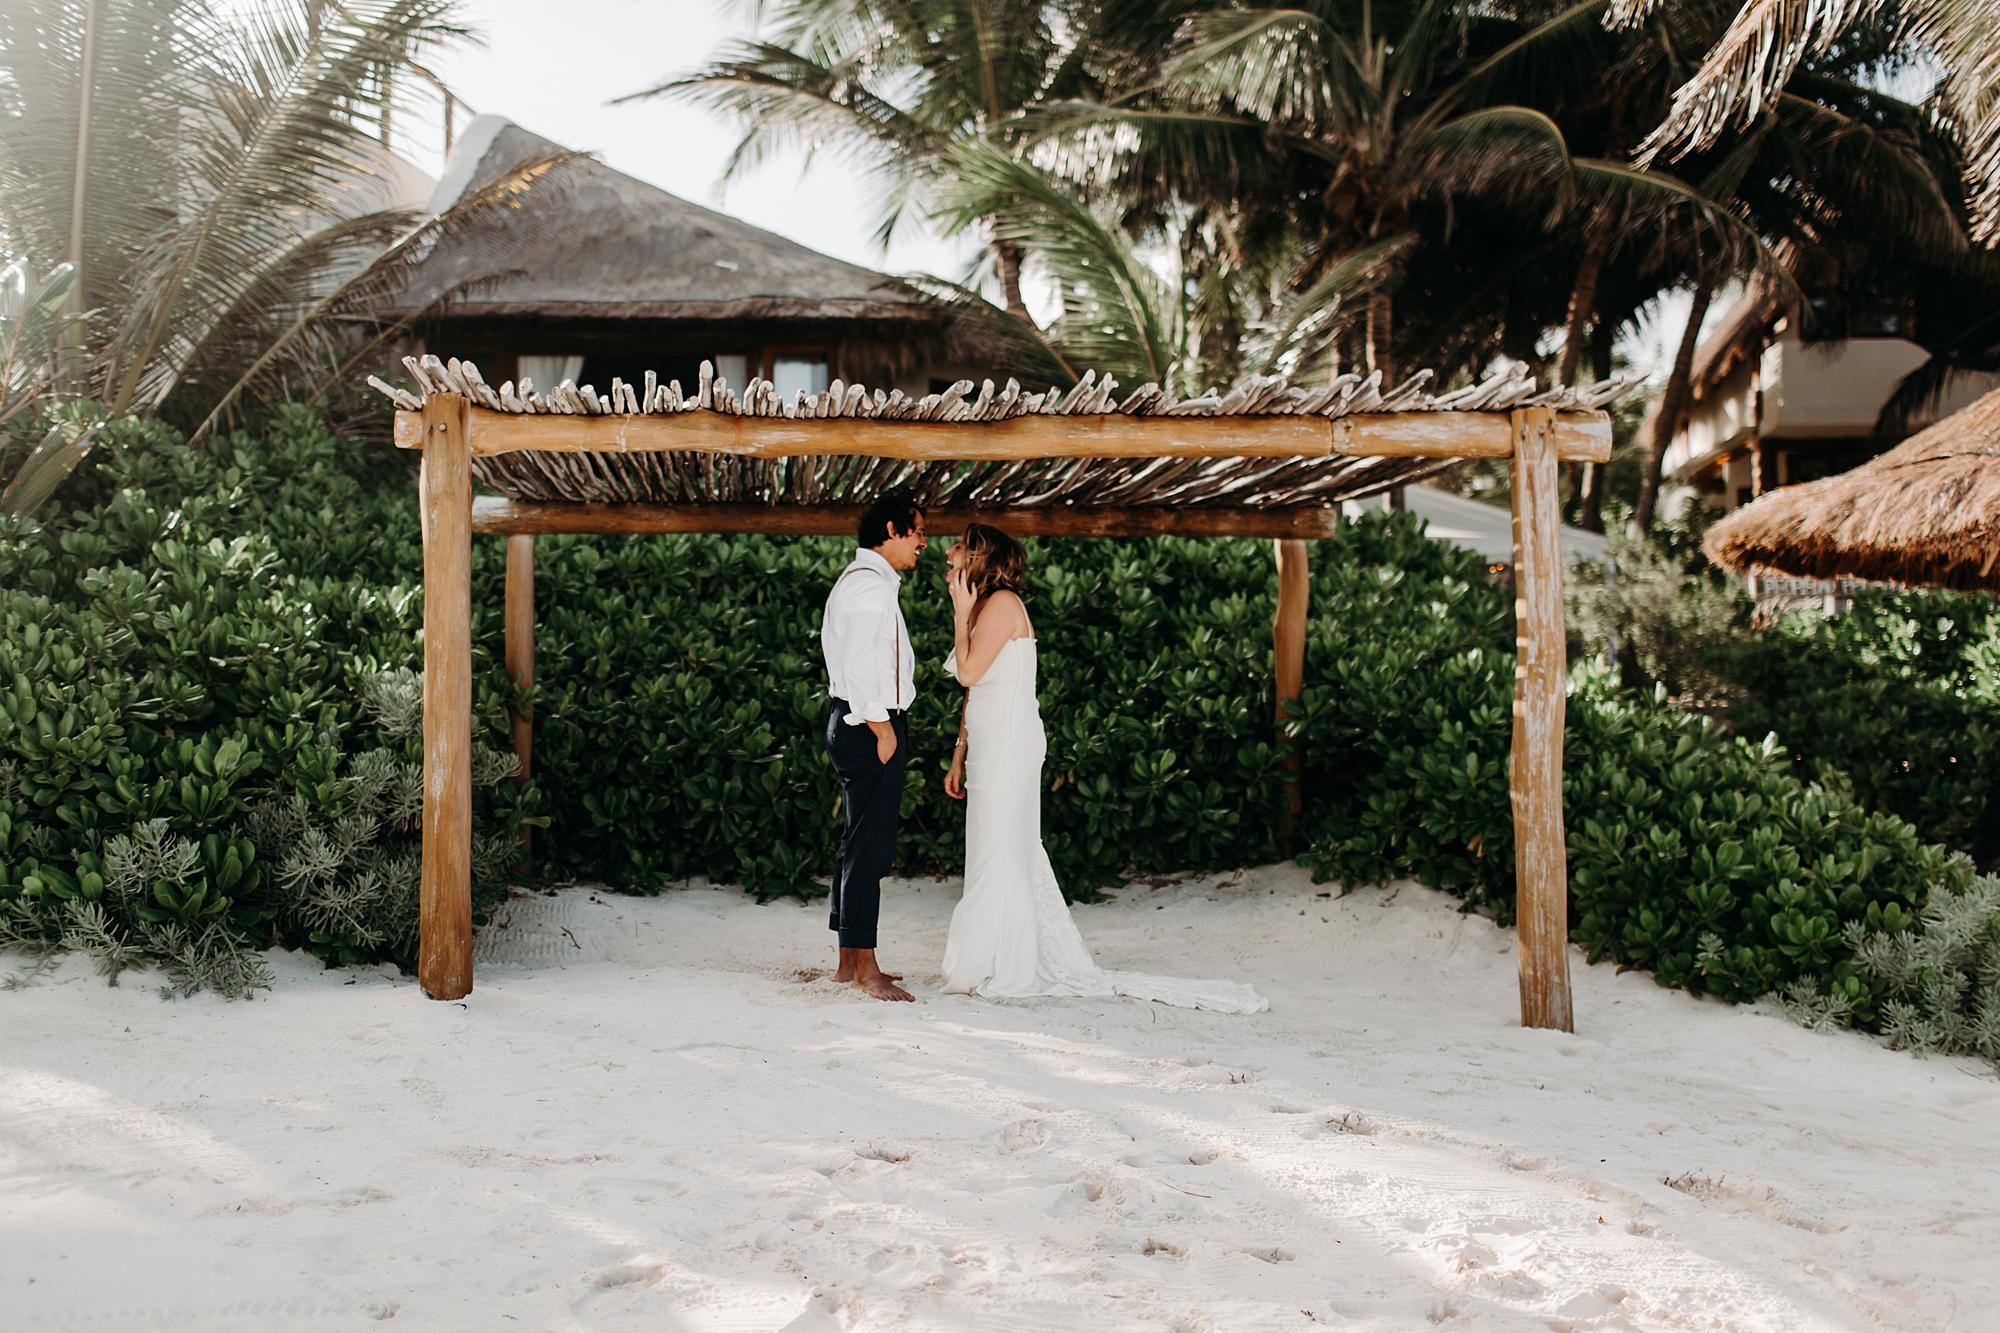 Danielle-San-Antonio-Wedding-Photographer-67_WEB.jpg